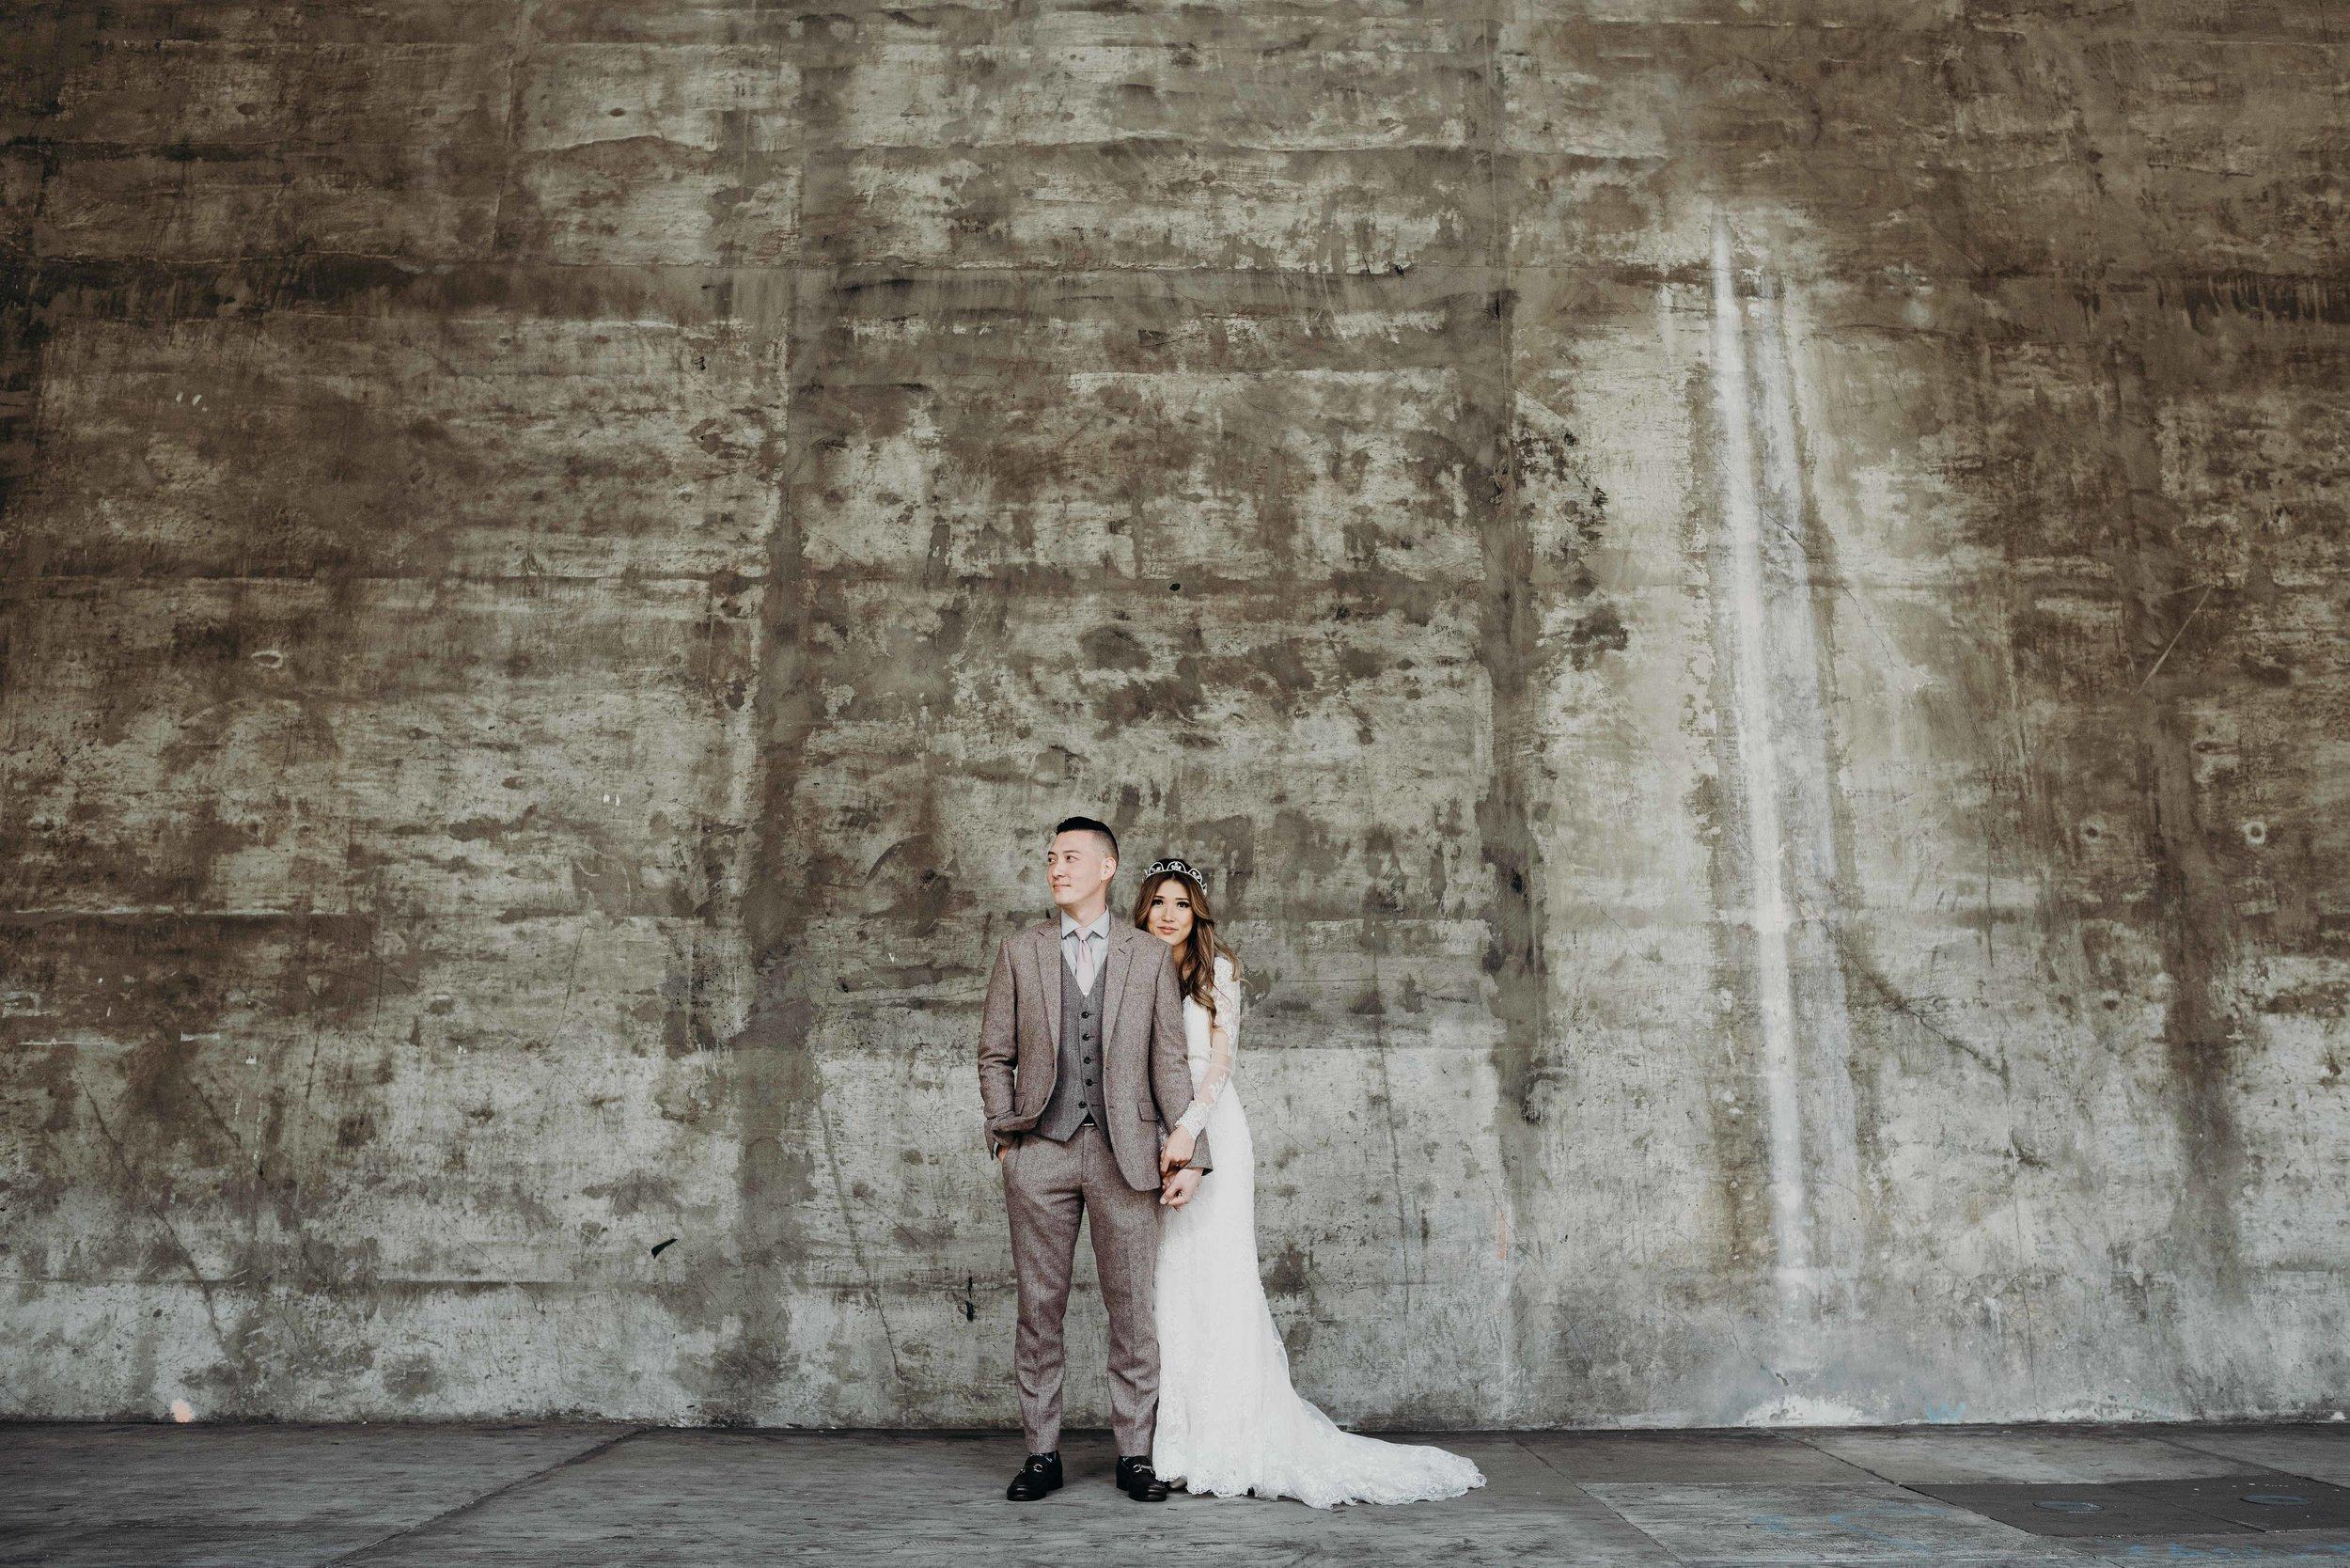 Cristina+Raymond Rd DTLA Millwick Wedding Post -_-52.jpg